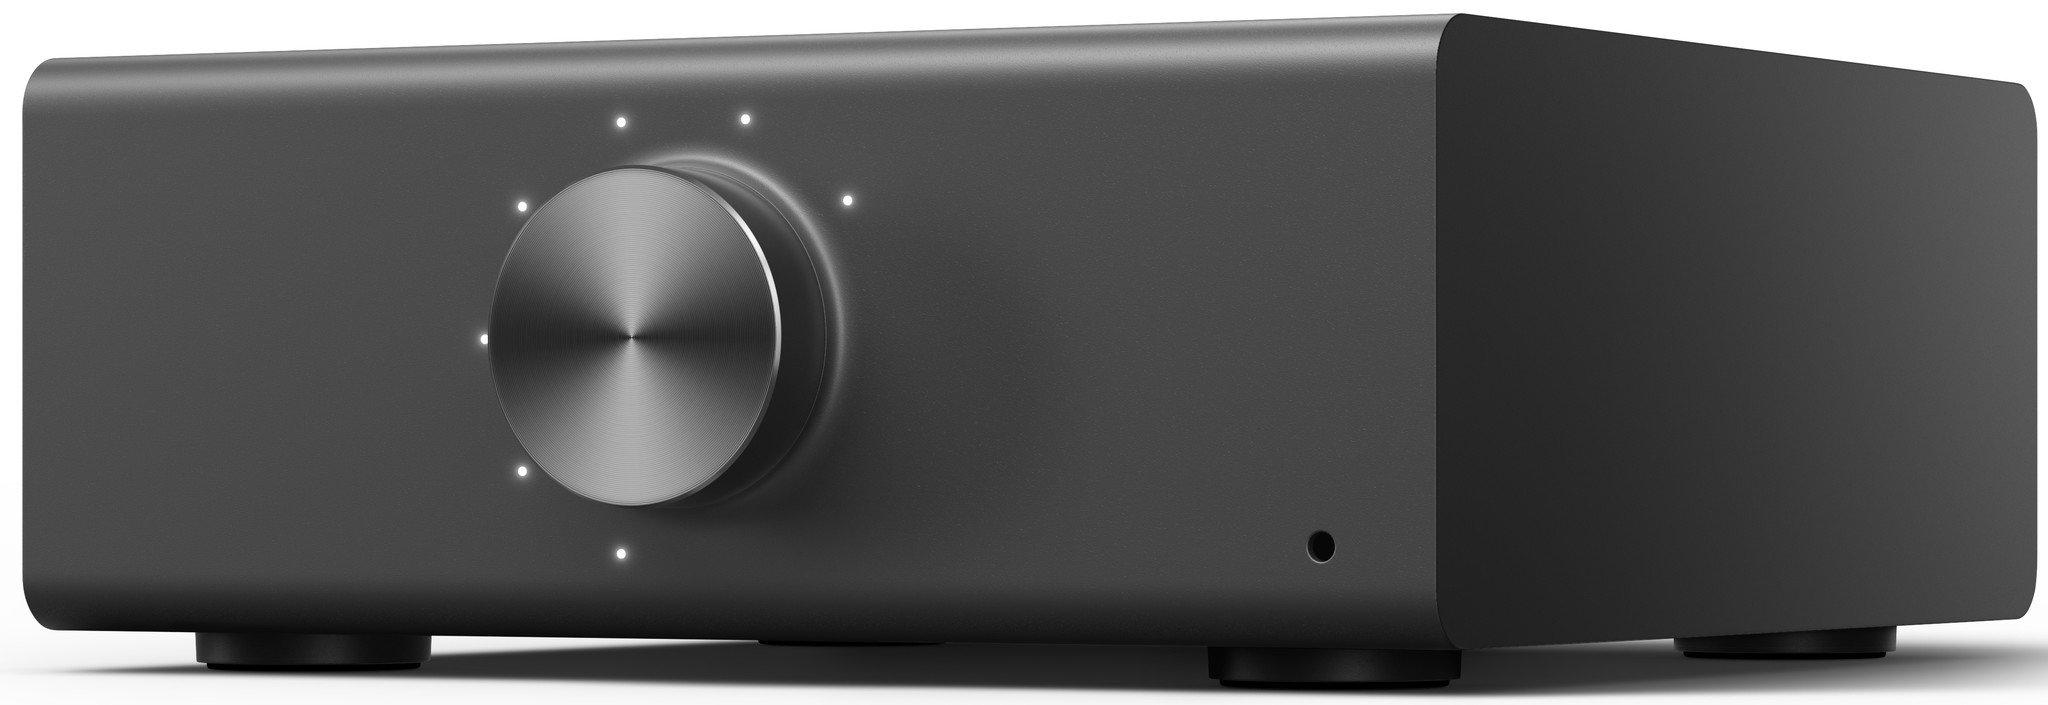 echo-link-amp-official-render.jpg?itok=d